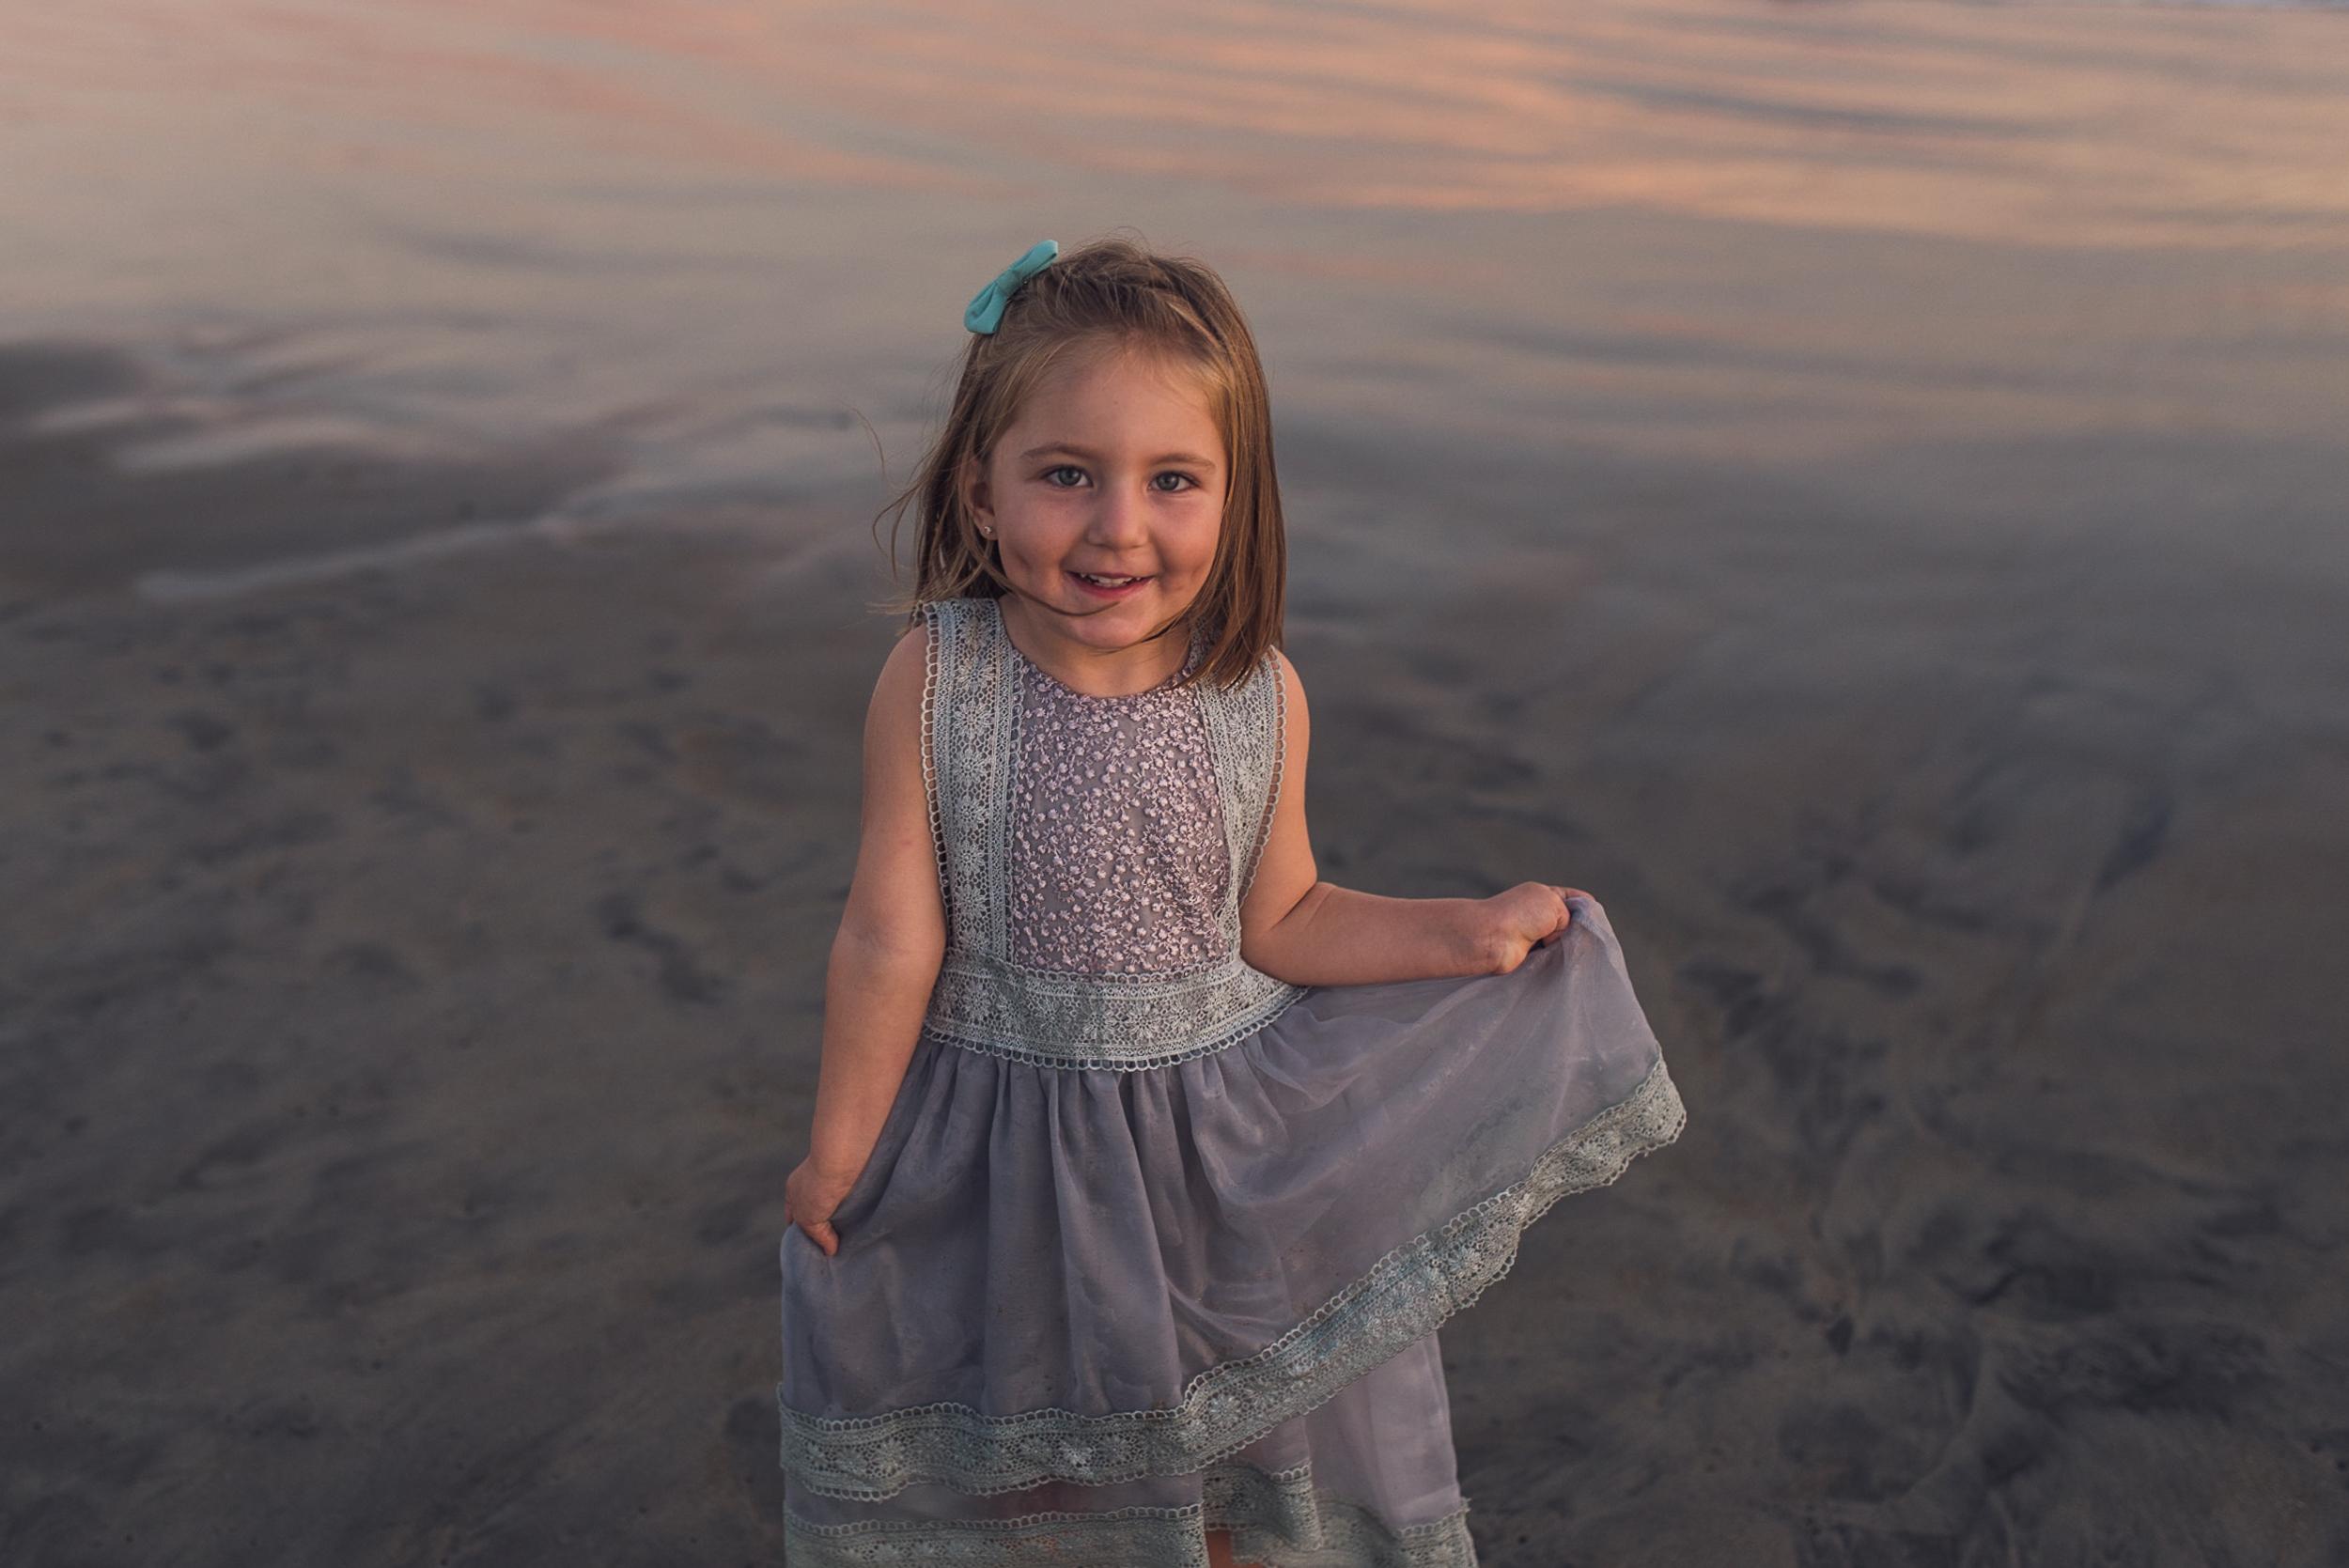 2018-San-Diego-Family-Lifestyle-Newborn-Travel-Vacation-Photographer-Kelsey-Smith-Photography-Coronado-La-Jolla-Encinitas-Solana-Beach-Del-Mar-211.jpg